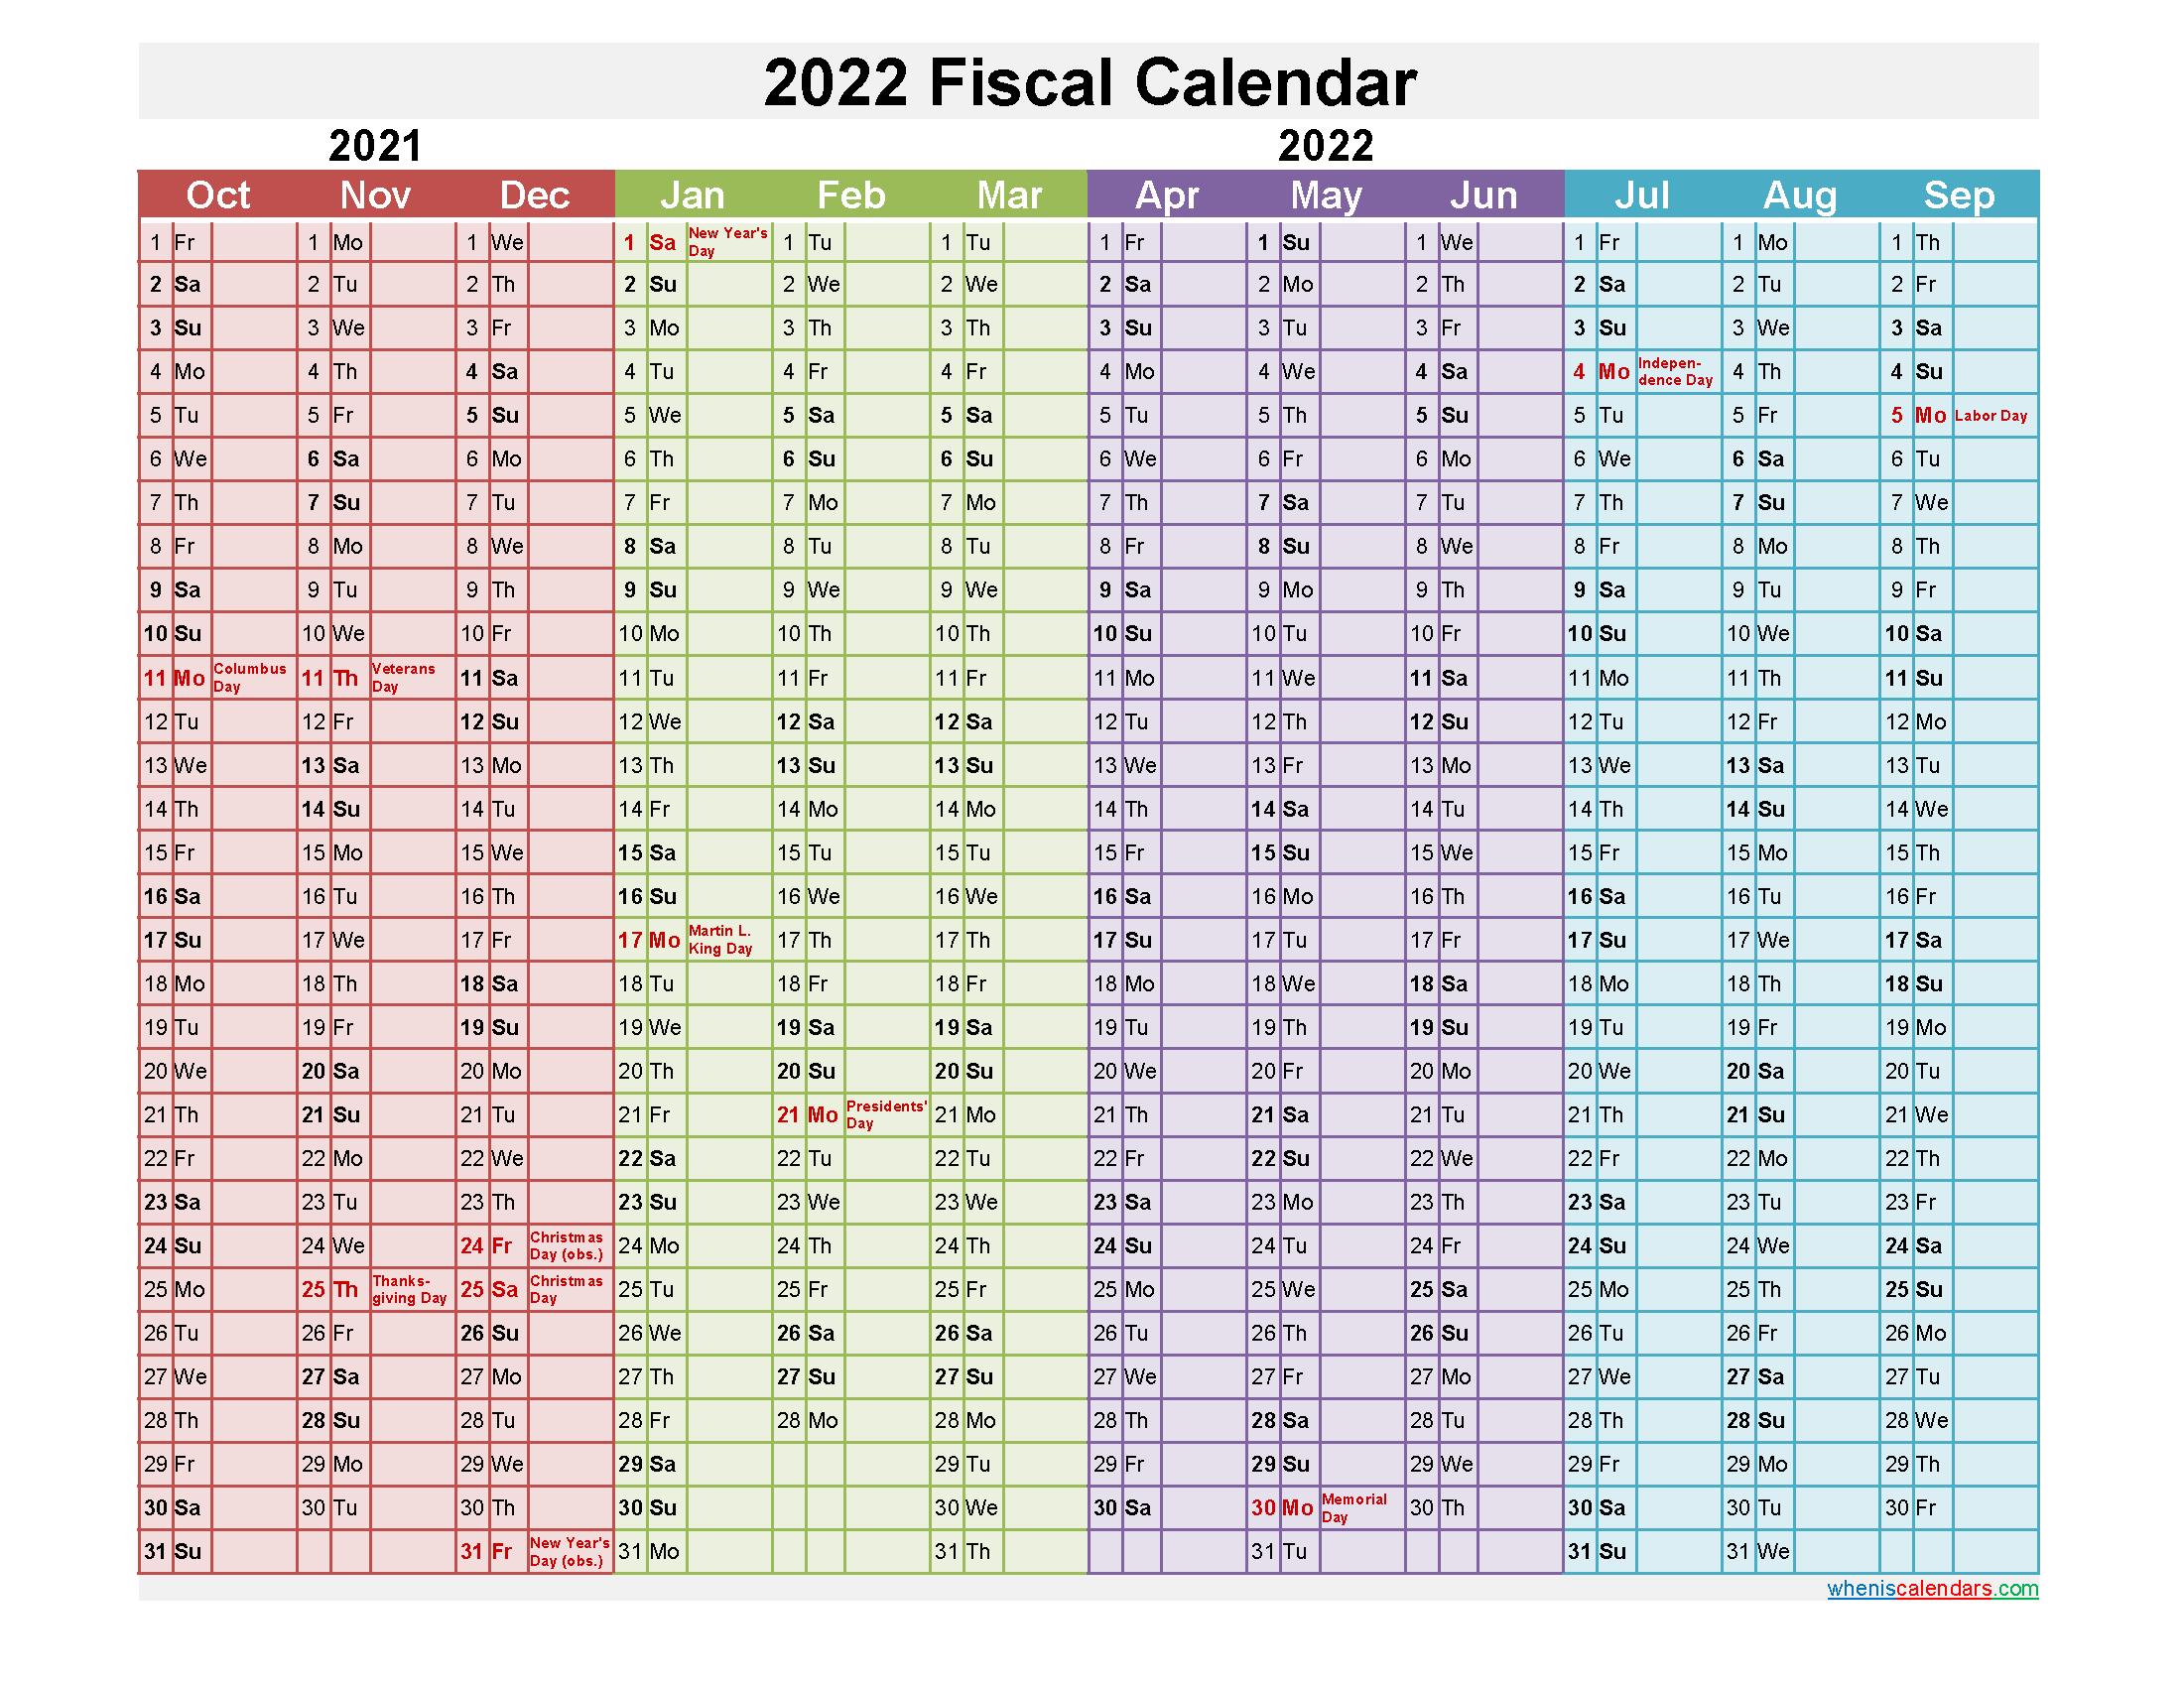 Fiscal Year 2022 Calendar